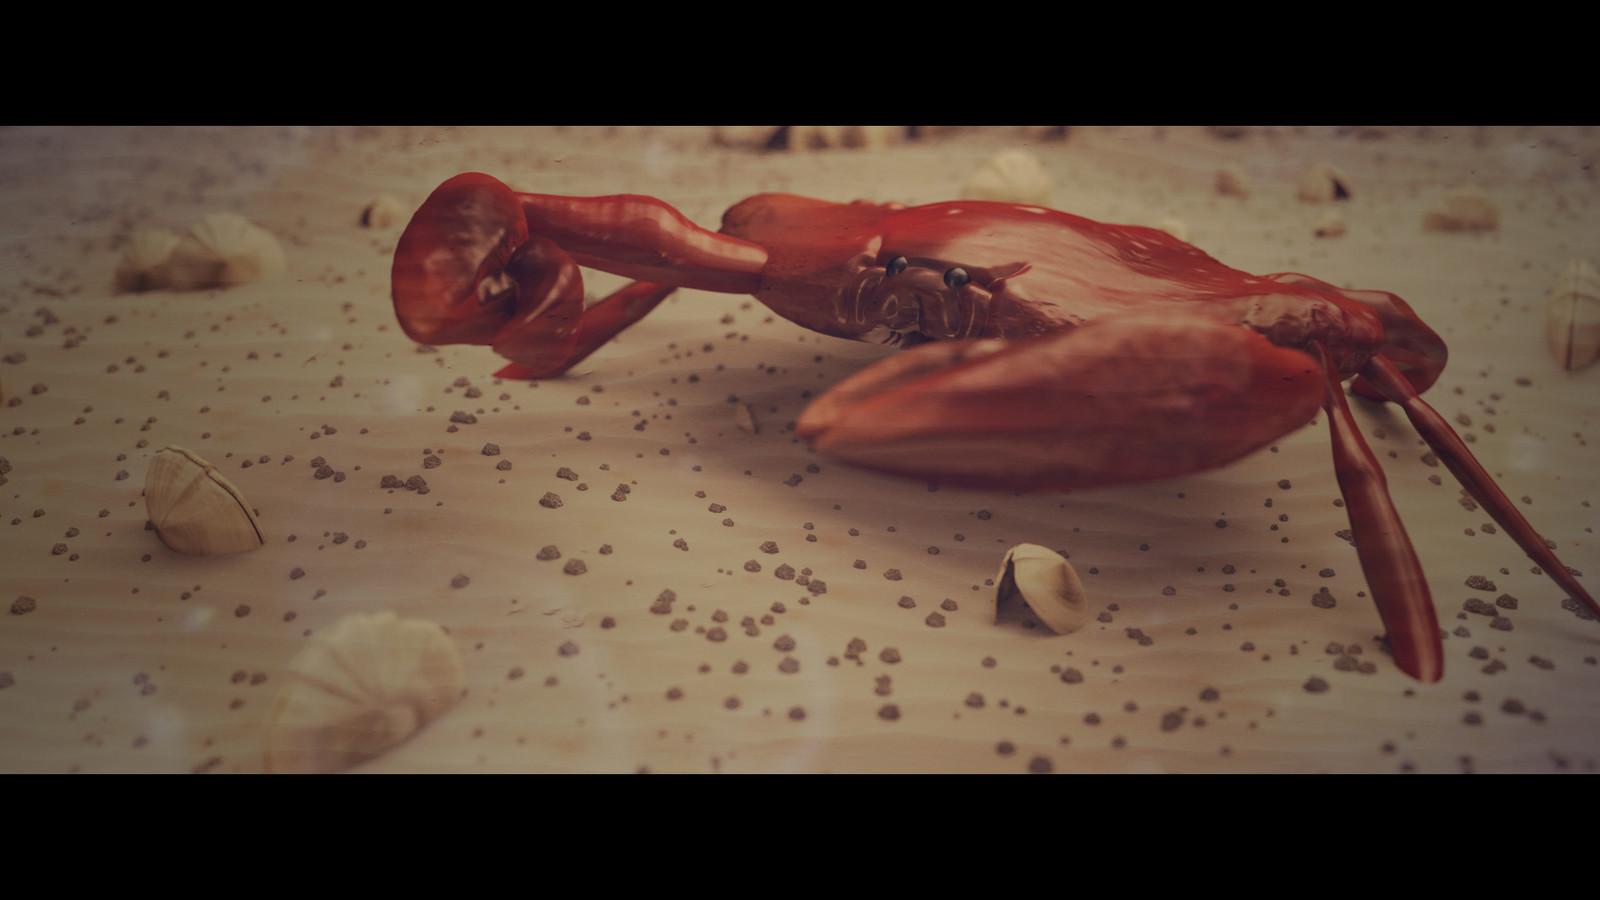 CGI CRAB - Study of the anatomy of a crab